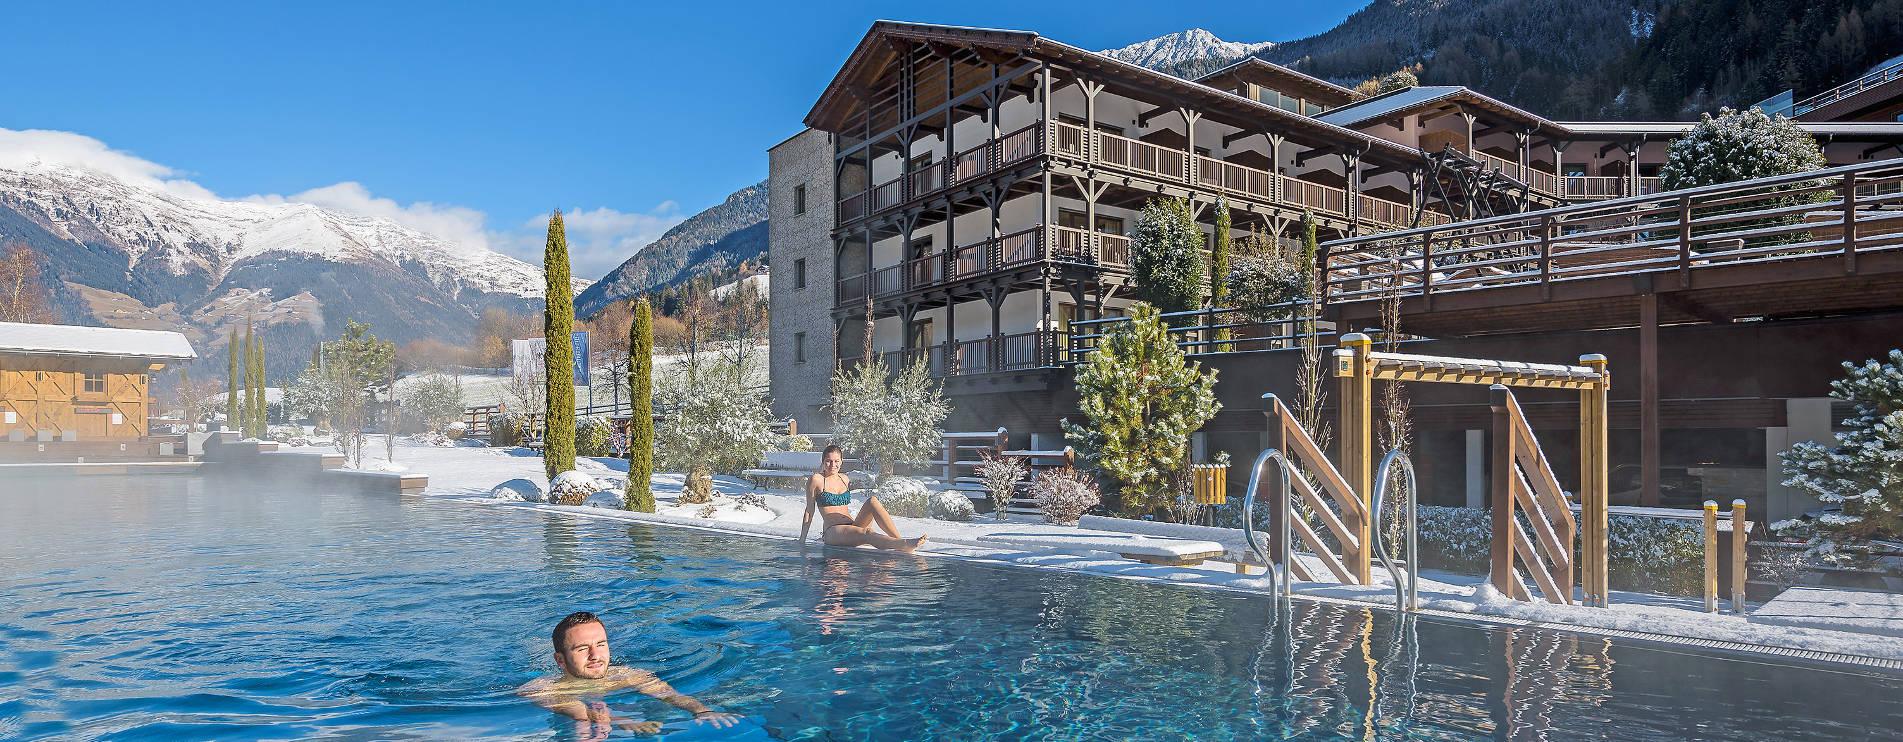 5 Stelle Hotel Andreus Val Passiria - Golf & Wellness Resort Alto Adige